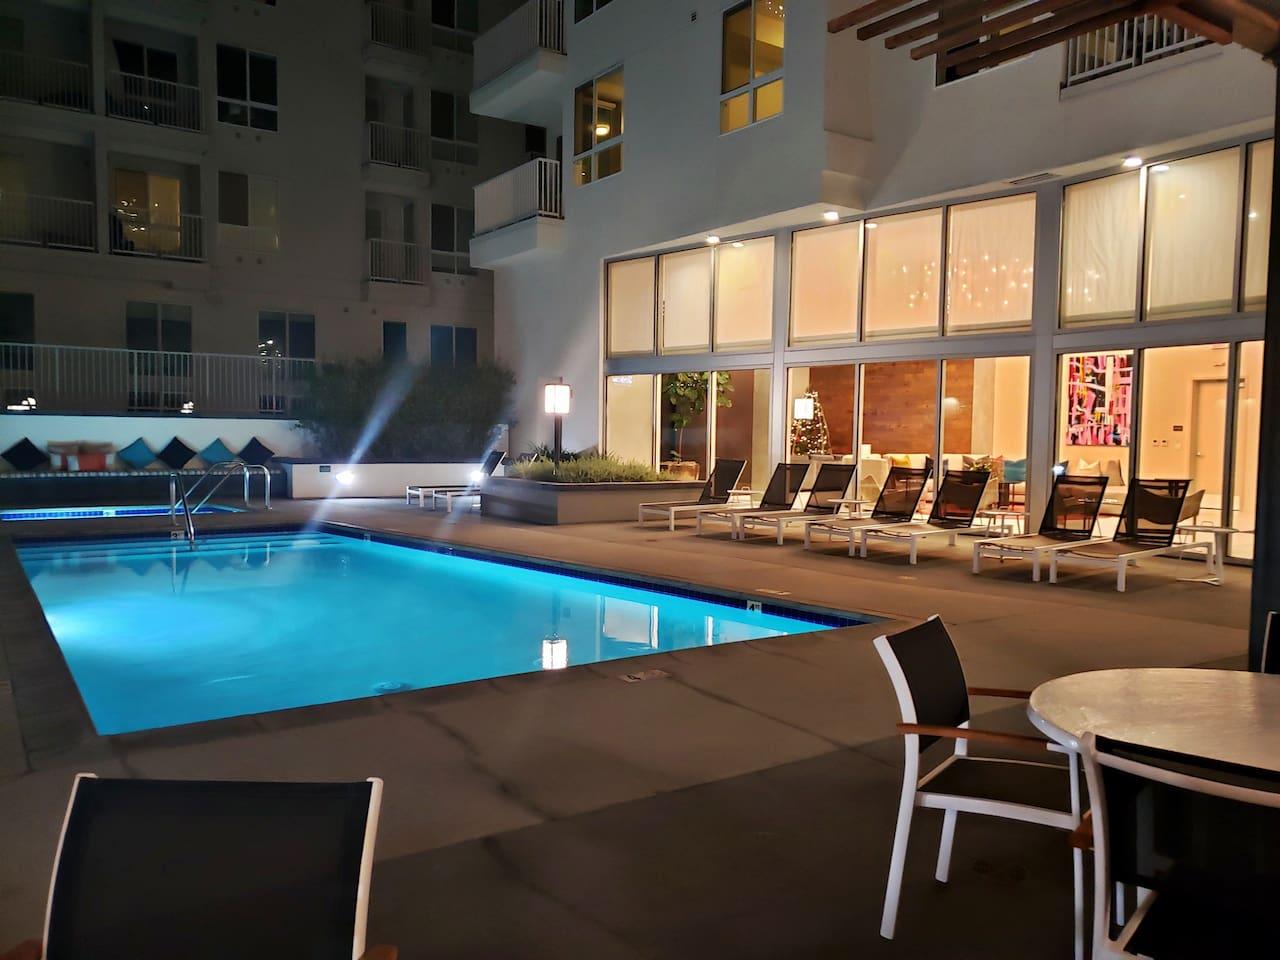 Swimming Furnished Rental